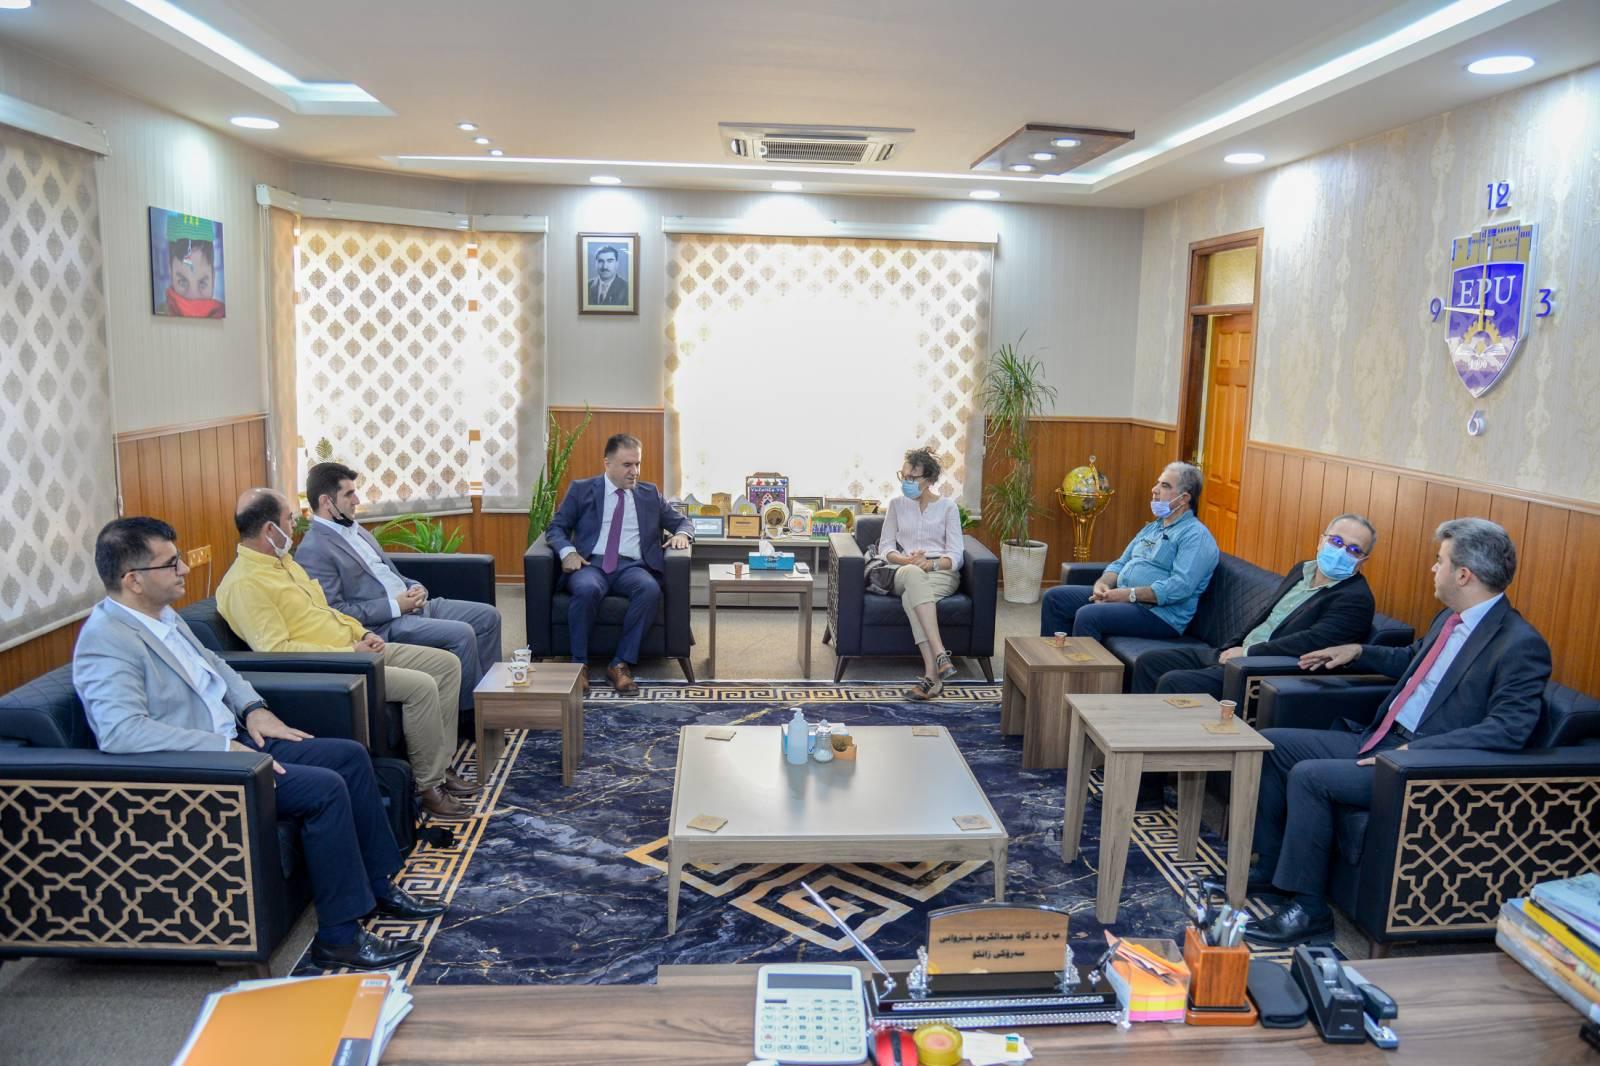 The Rector of the Erbil Polytechnic University Received An Italian Organization